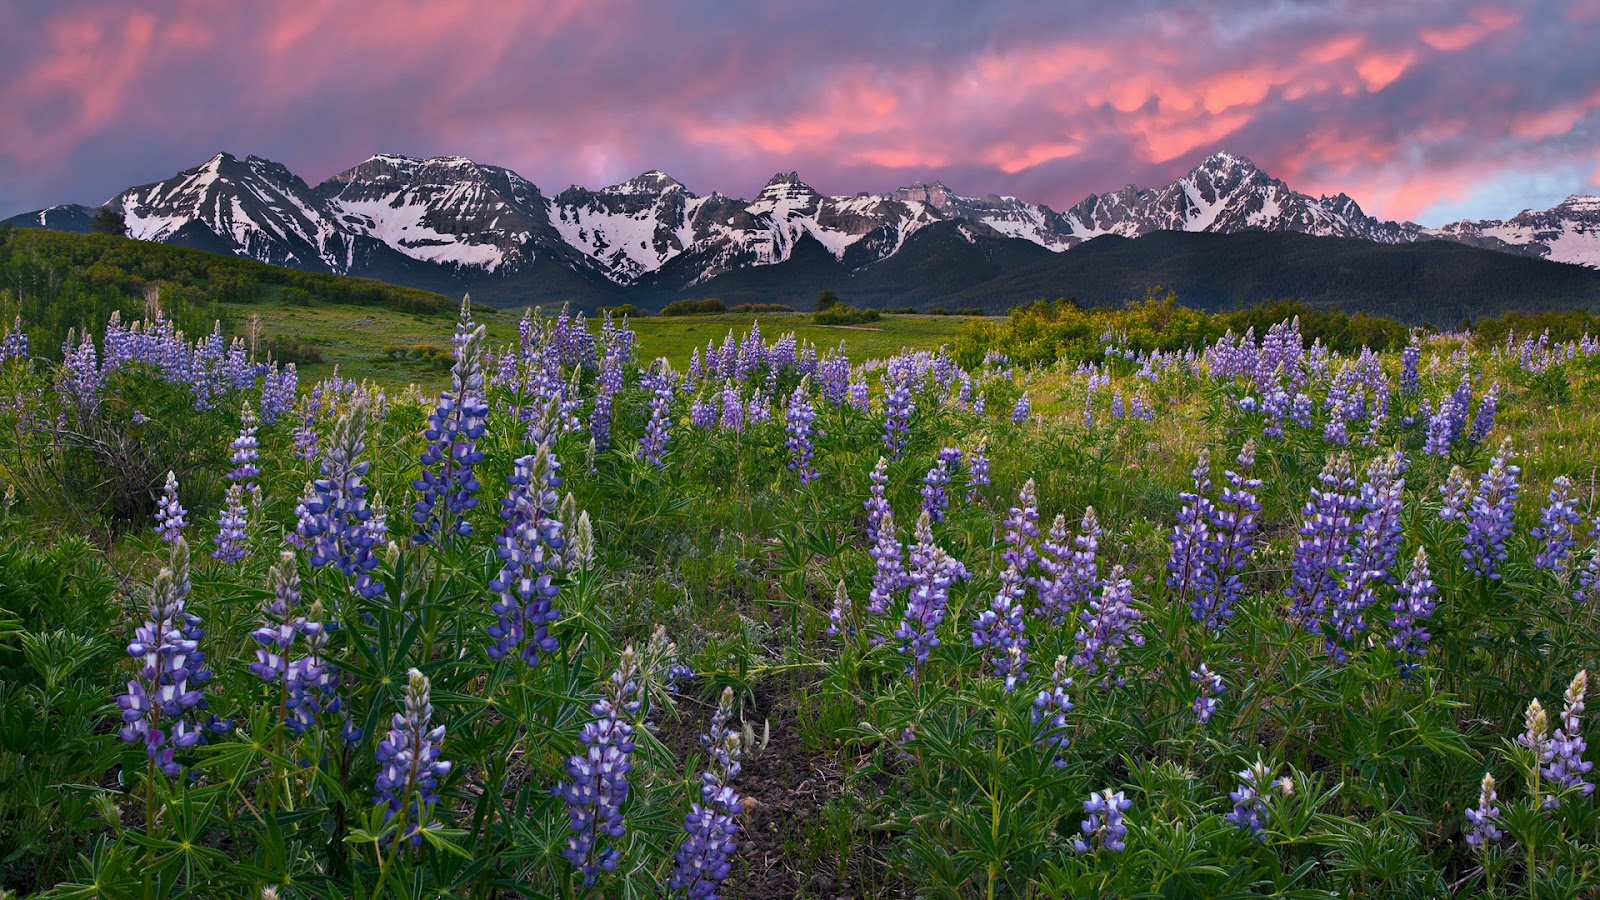 http://2.bp.blogspot.com/-MzF2LRtJcqM/UA1W_zYvVCI/AAAAAAAAATQ/n_s7XIrj-Ng/s1600/Alpine+Meadow,+San+Juan+Mountains,+Rocky+Mountains,+Colorado.jpg